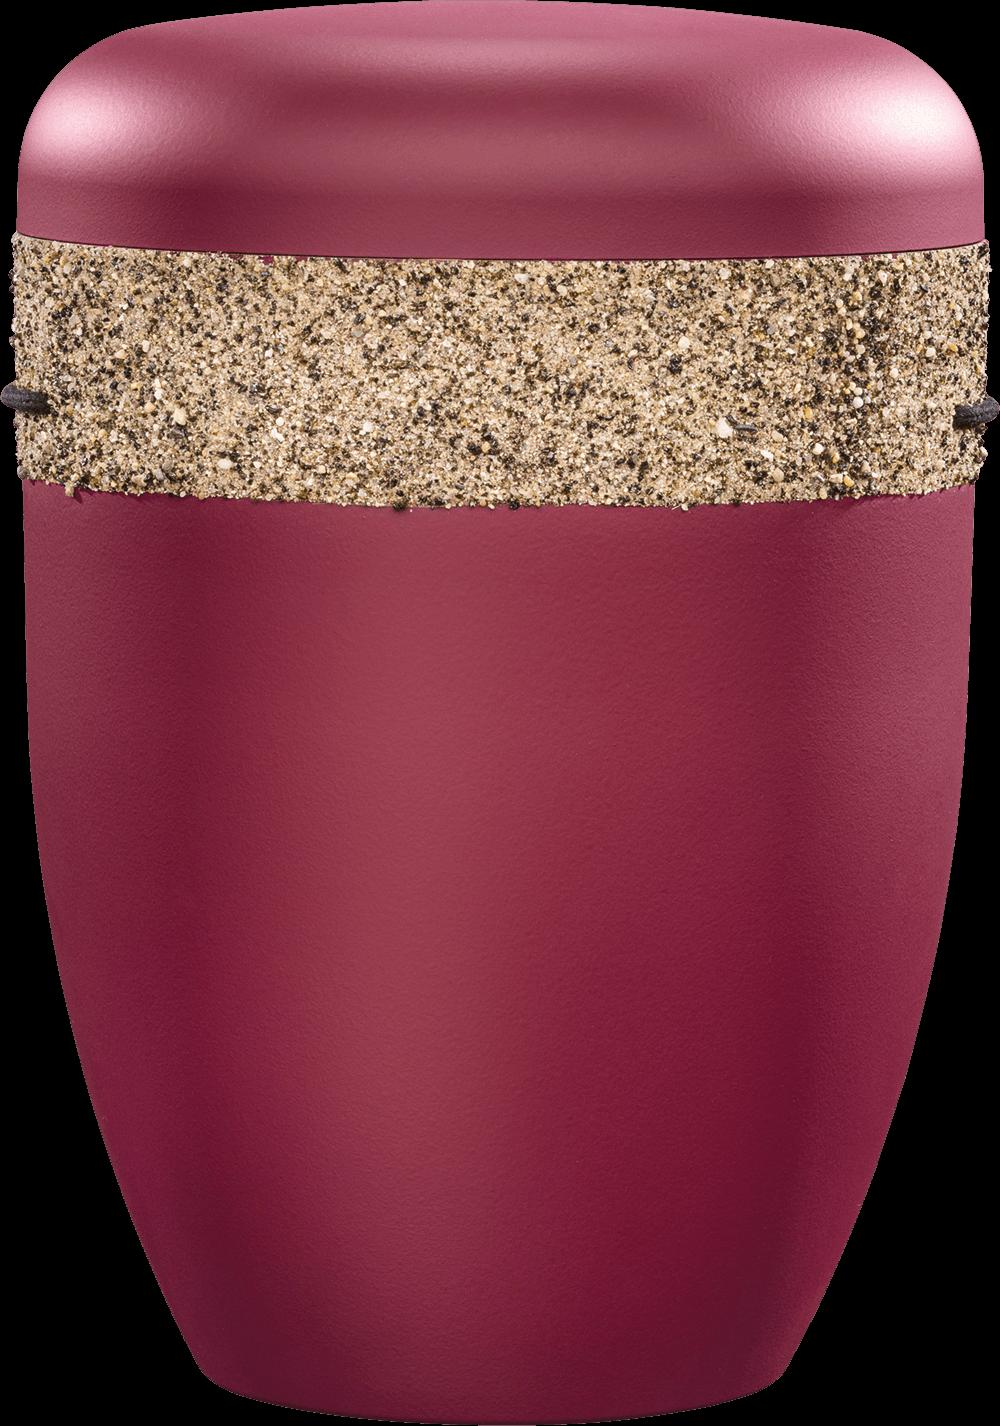 IKT 1453 Bordeaux   Reliefband   Natursand